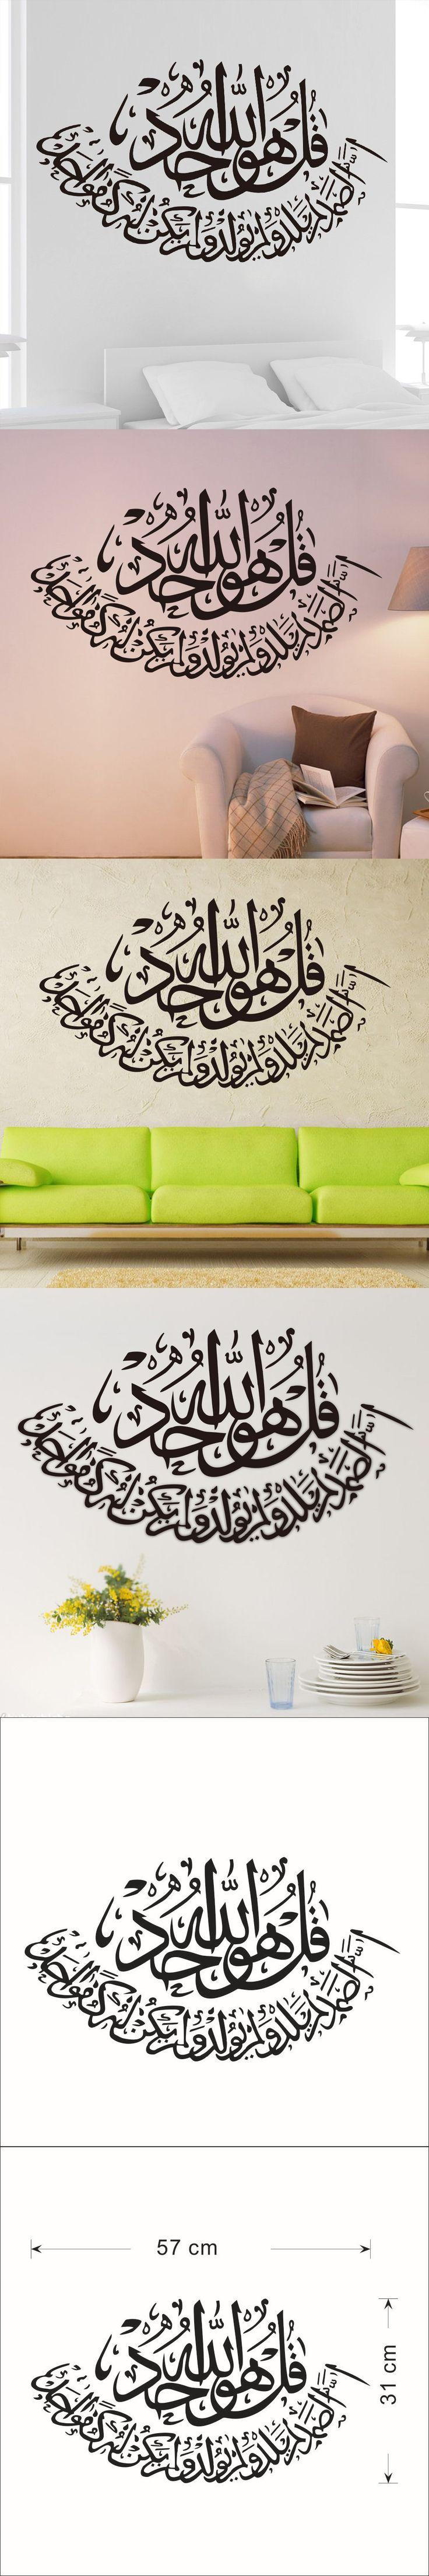 Islamic Muslim Arabic Inspiration Art Wall Stickers Love Removable Living Room Poster Vinyl Bedroom Decoration Home Decor Mural $5.7